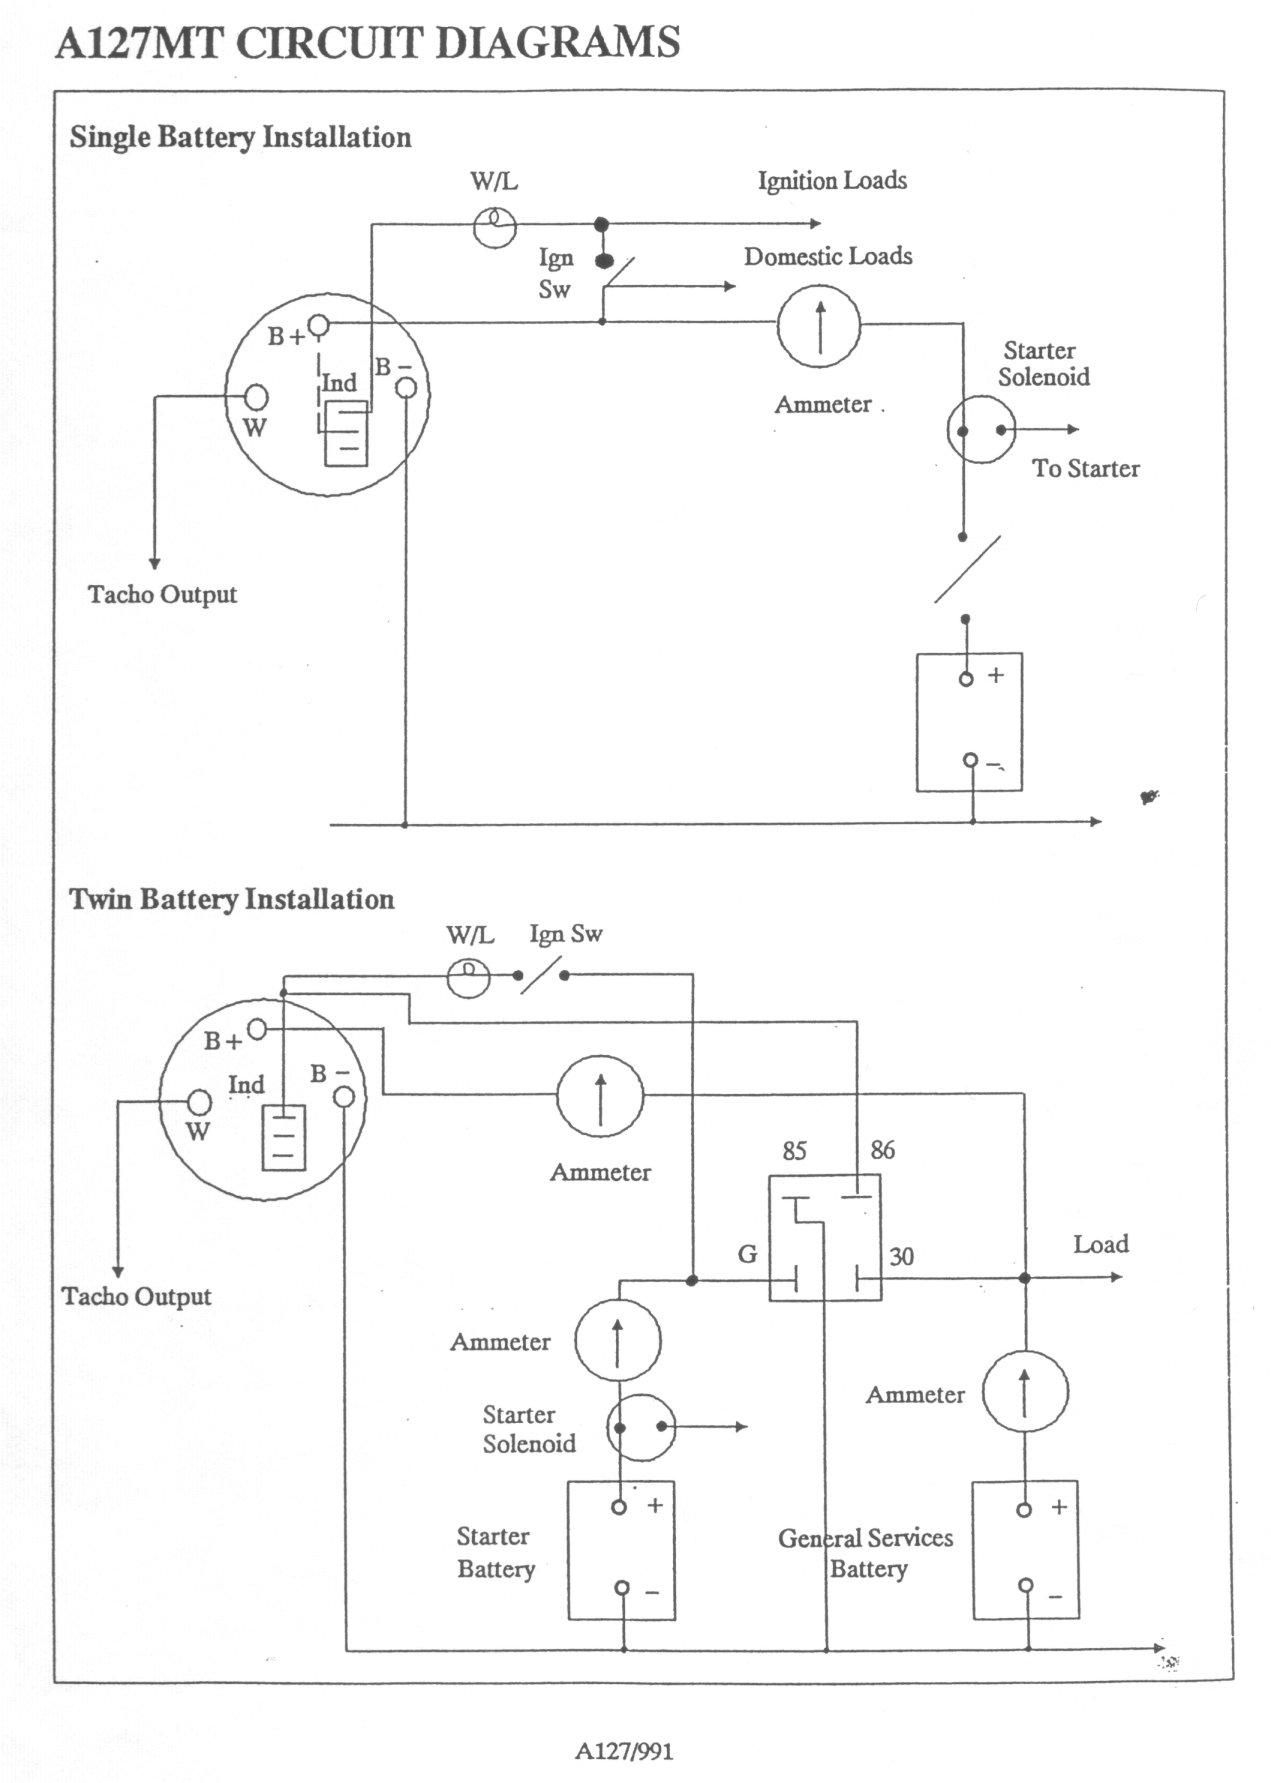 ON_3651] Acdelco Alternator Wiring Diagram Free Download Wiring DiagramBotse Eumqu Vira Mohammedshrine Librar Wiring 101